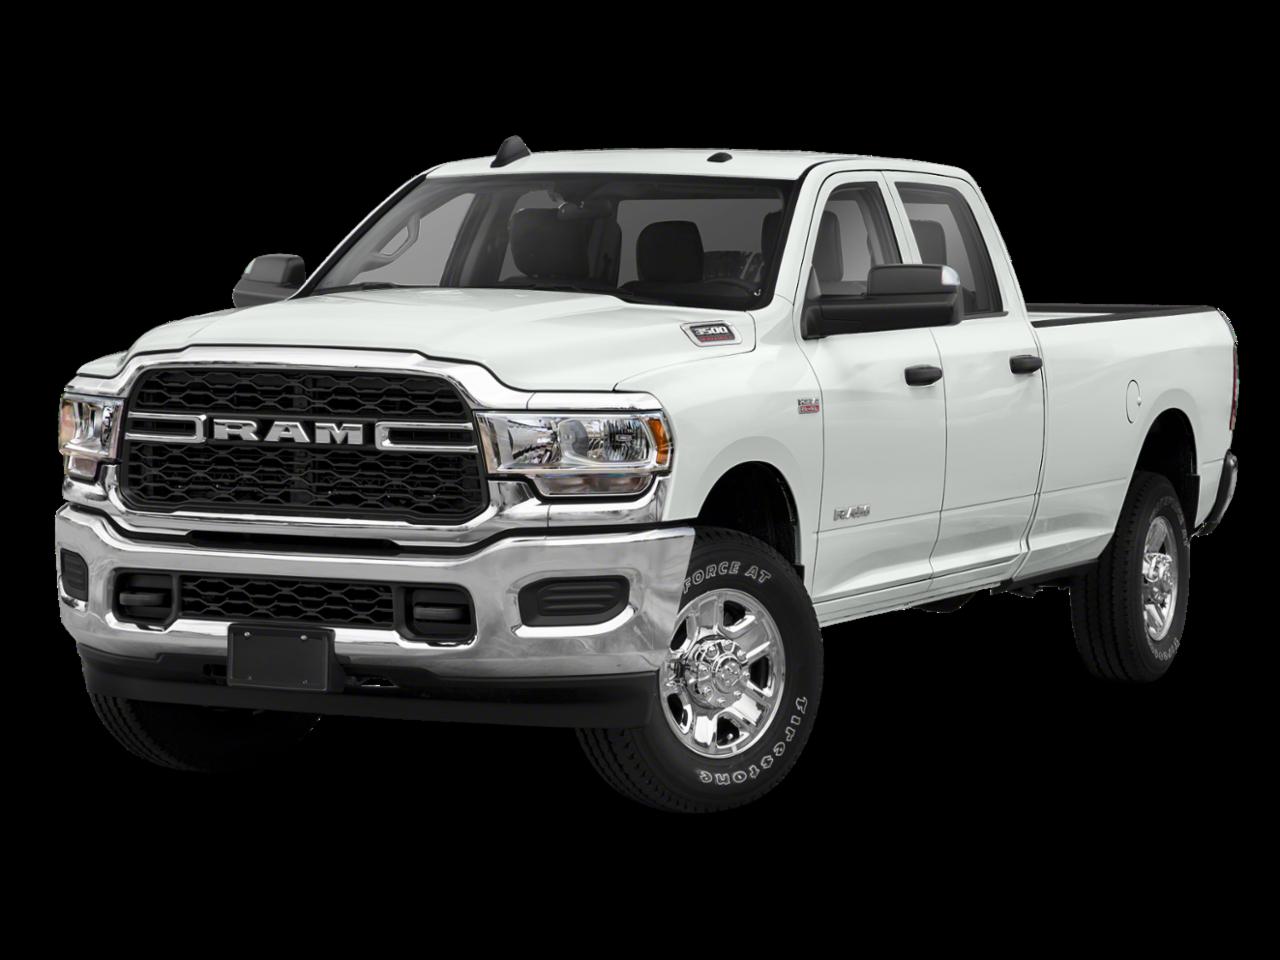 "New 2019 Ram<br /><span class=""vdp-trim"">3500 Tradesman 4WD Crew Cab Pickup</span>"